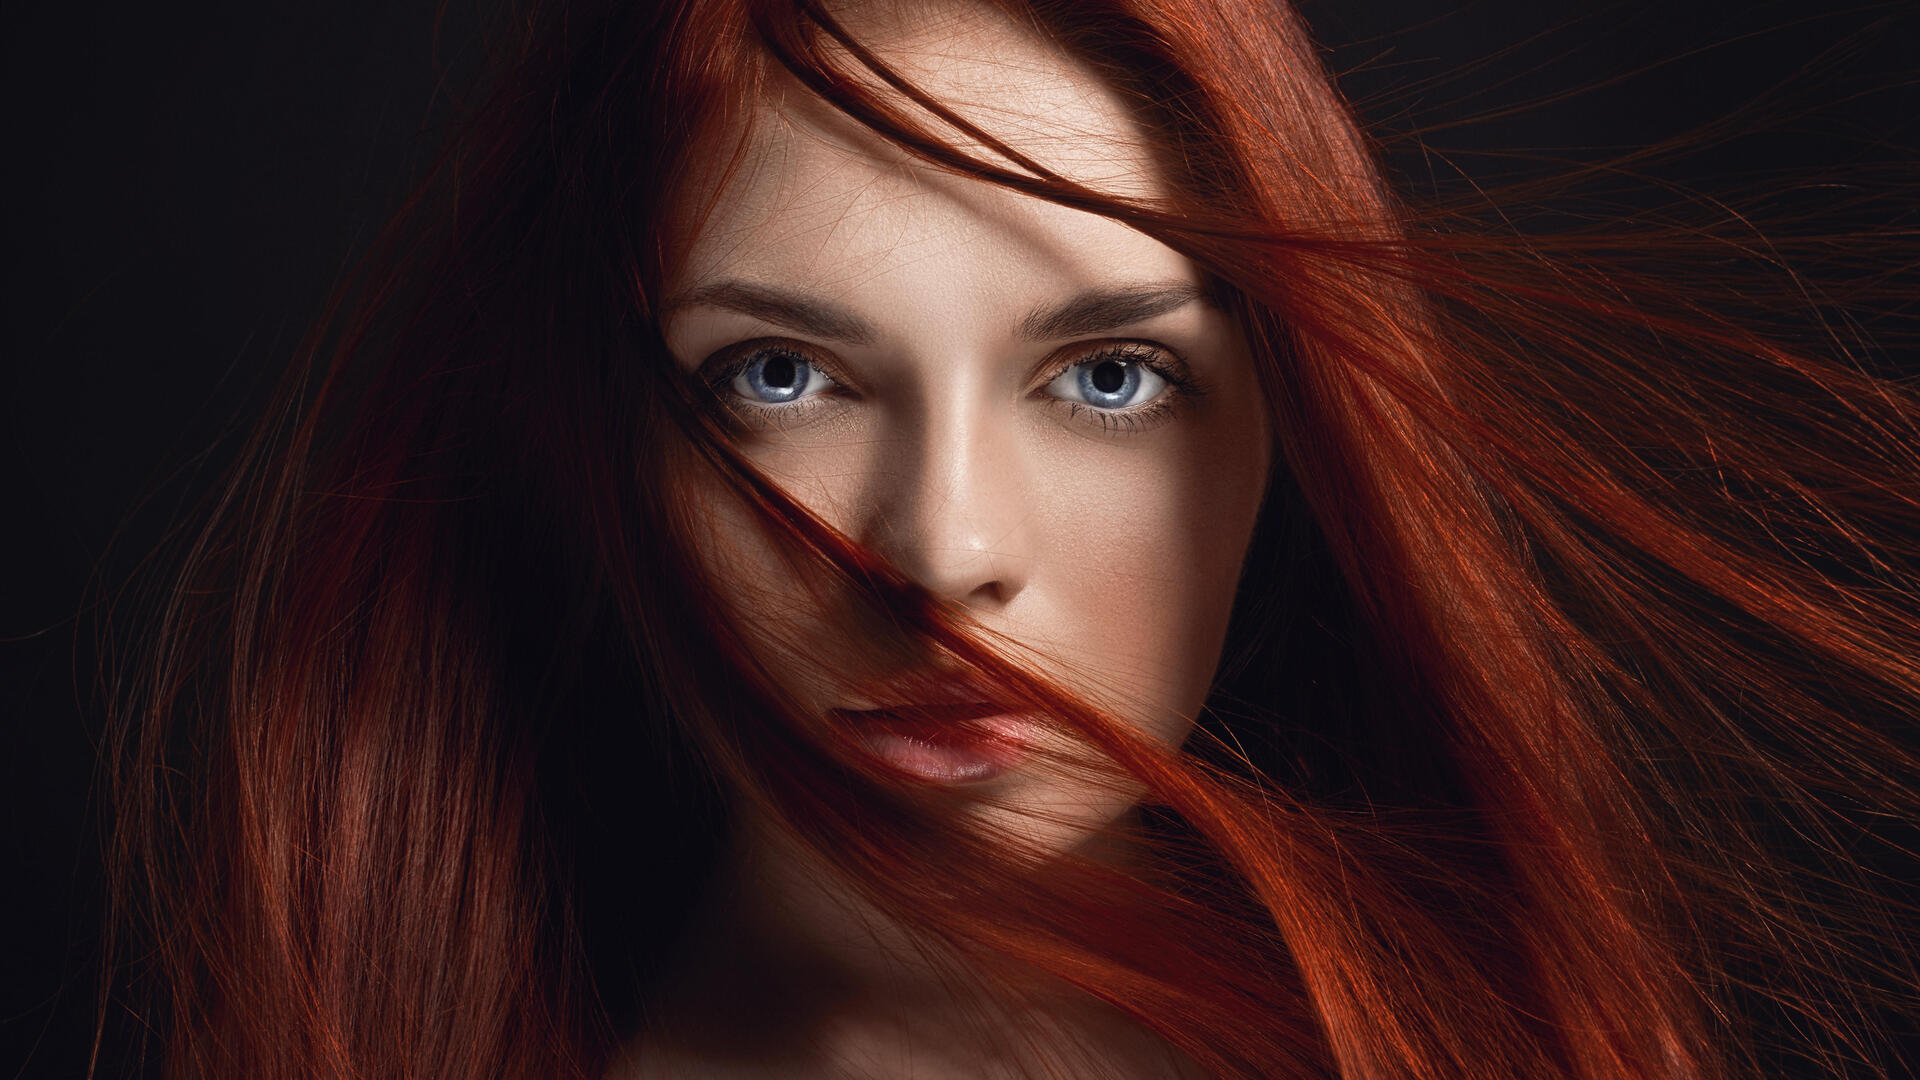 1920X1080 Redhead Girl Hairs On Face 4K 5K Laptop Full Hd